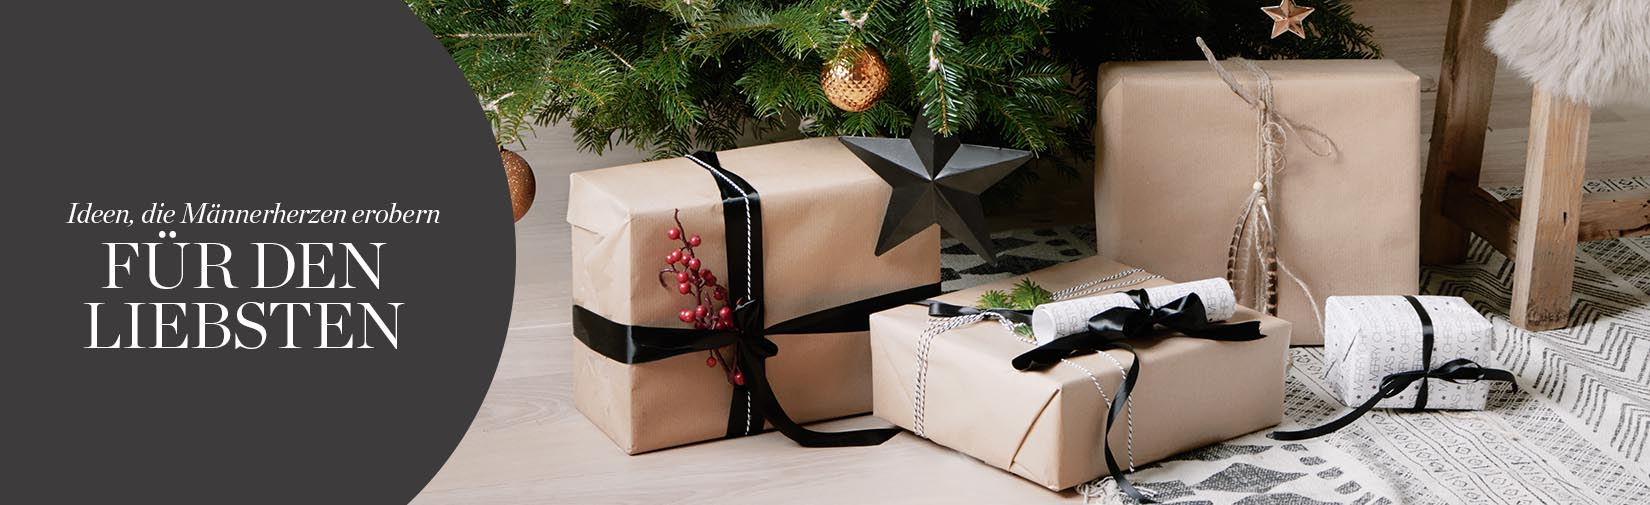 LP_Geschenke-SpezialLP-Geschenke-Special_liebster-desktop